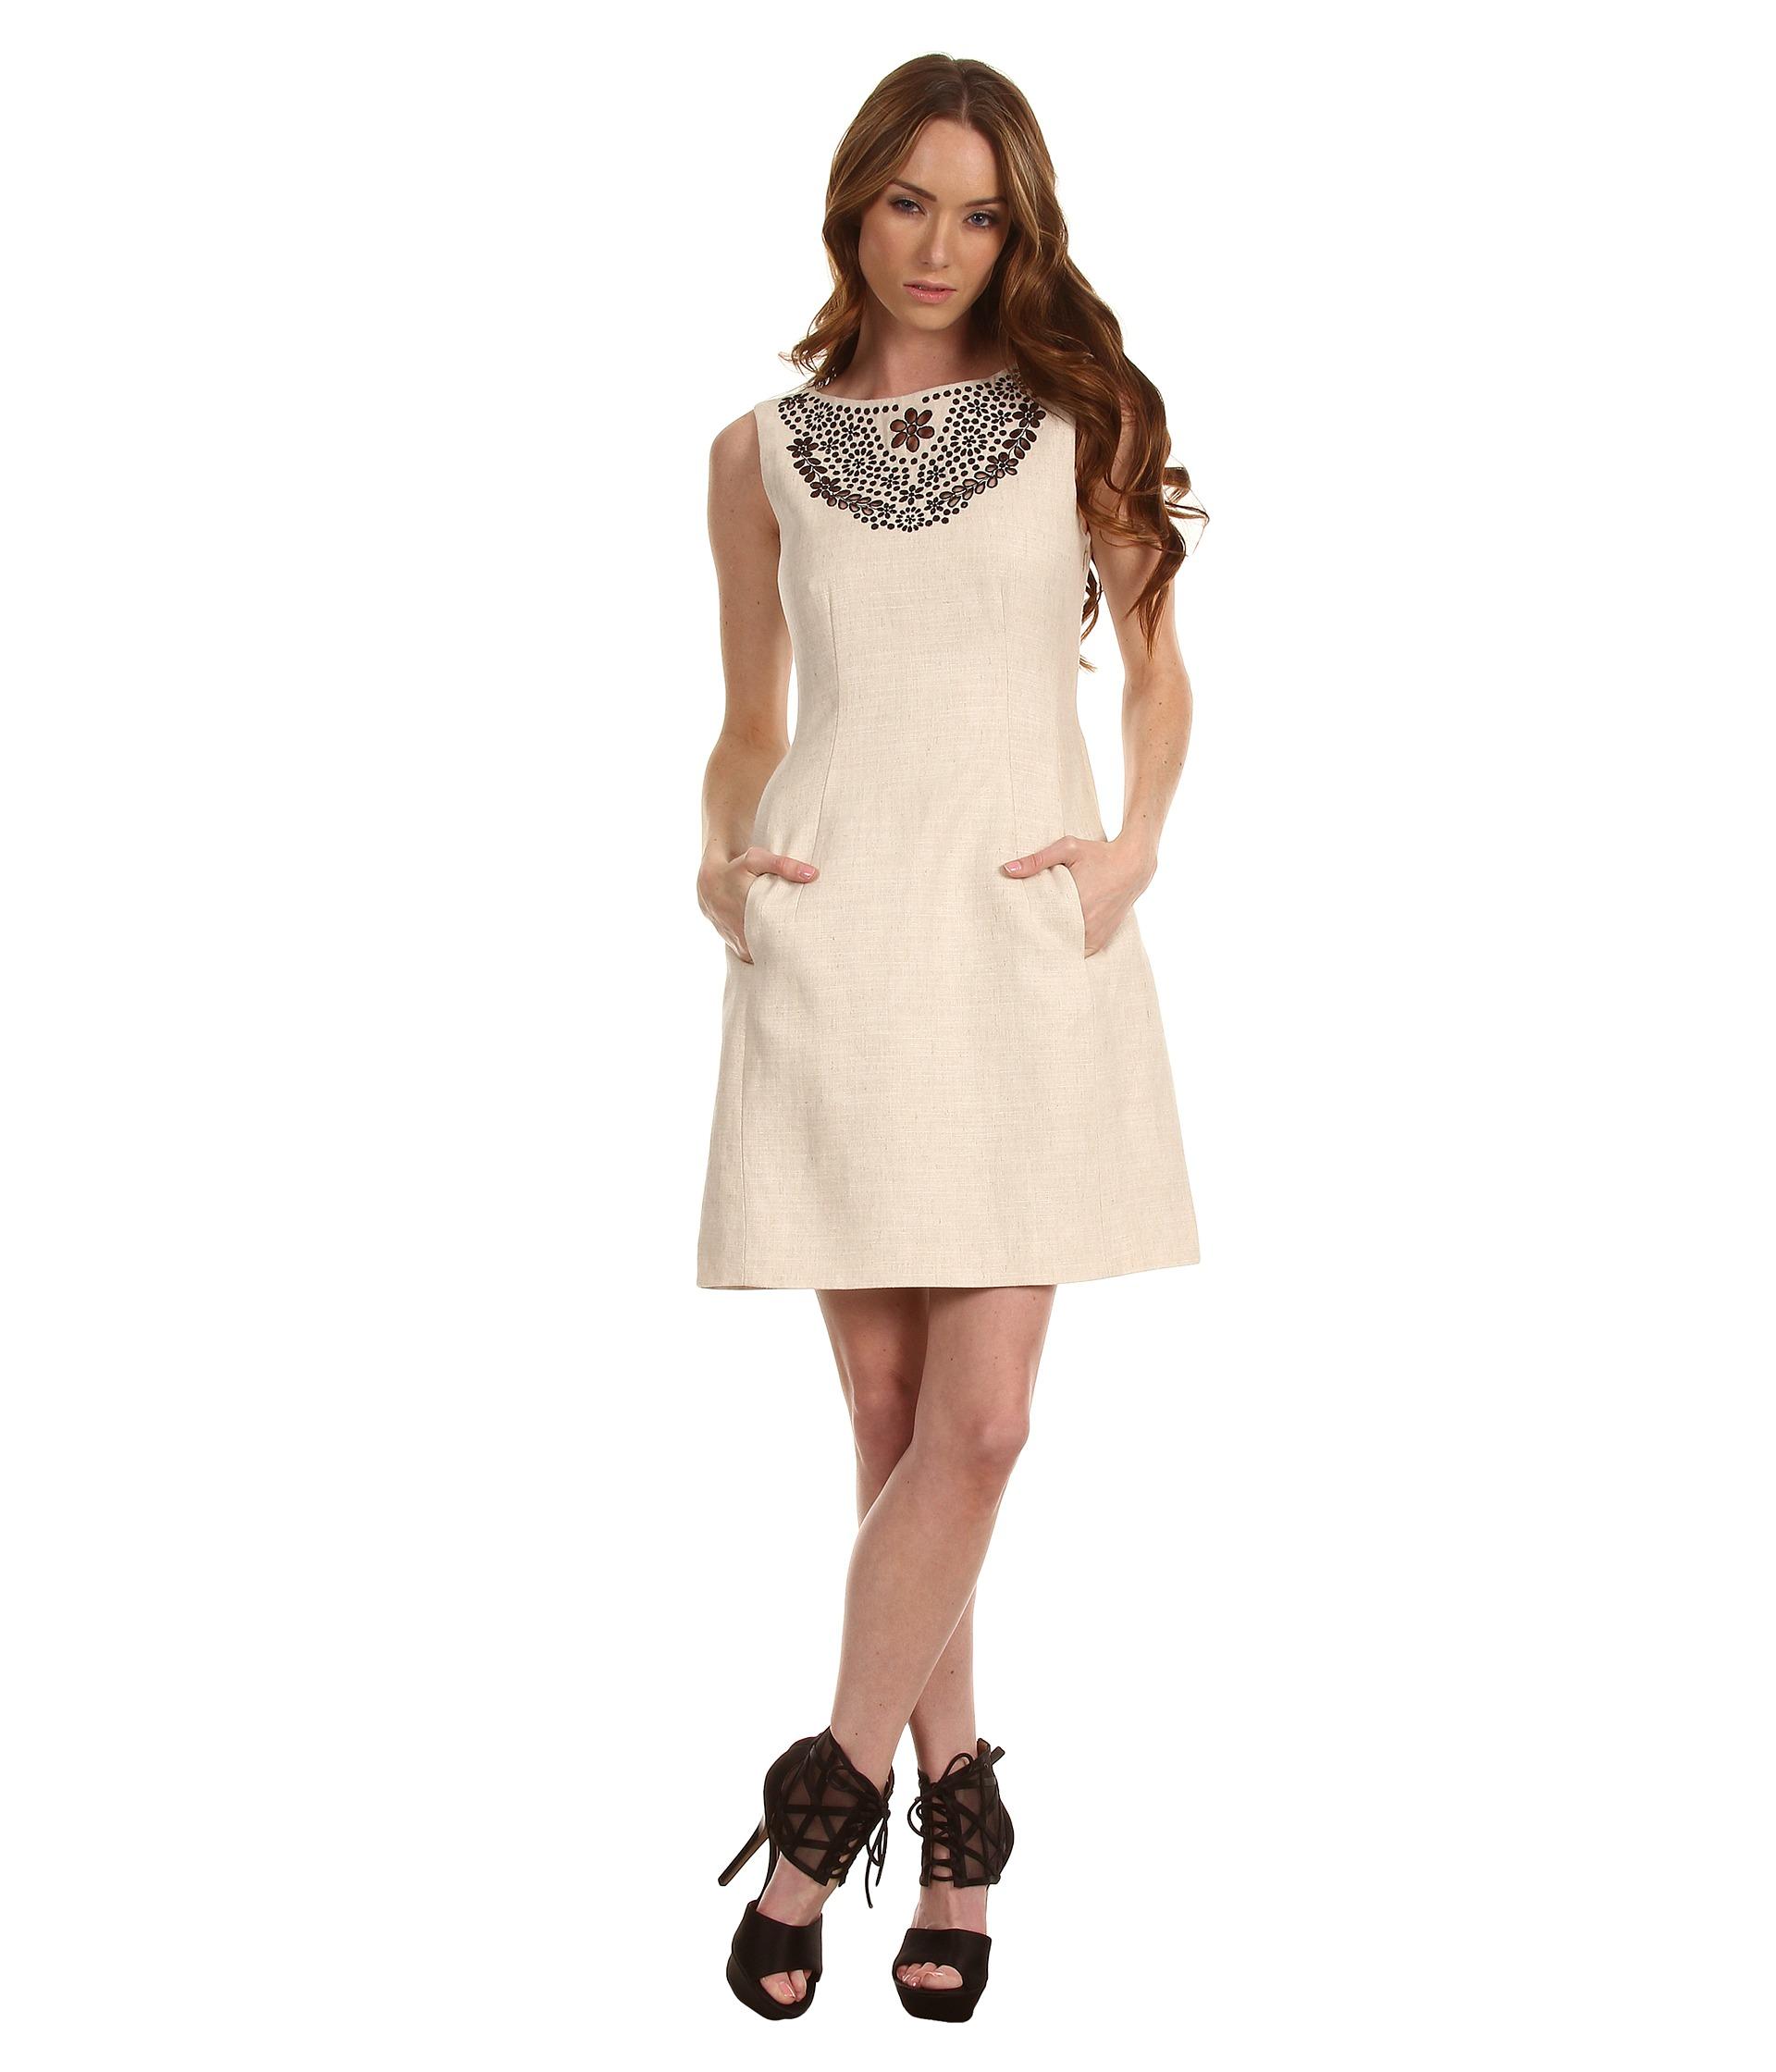 Kate Spade New York Domino Dress